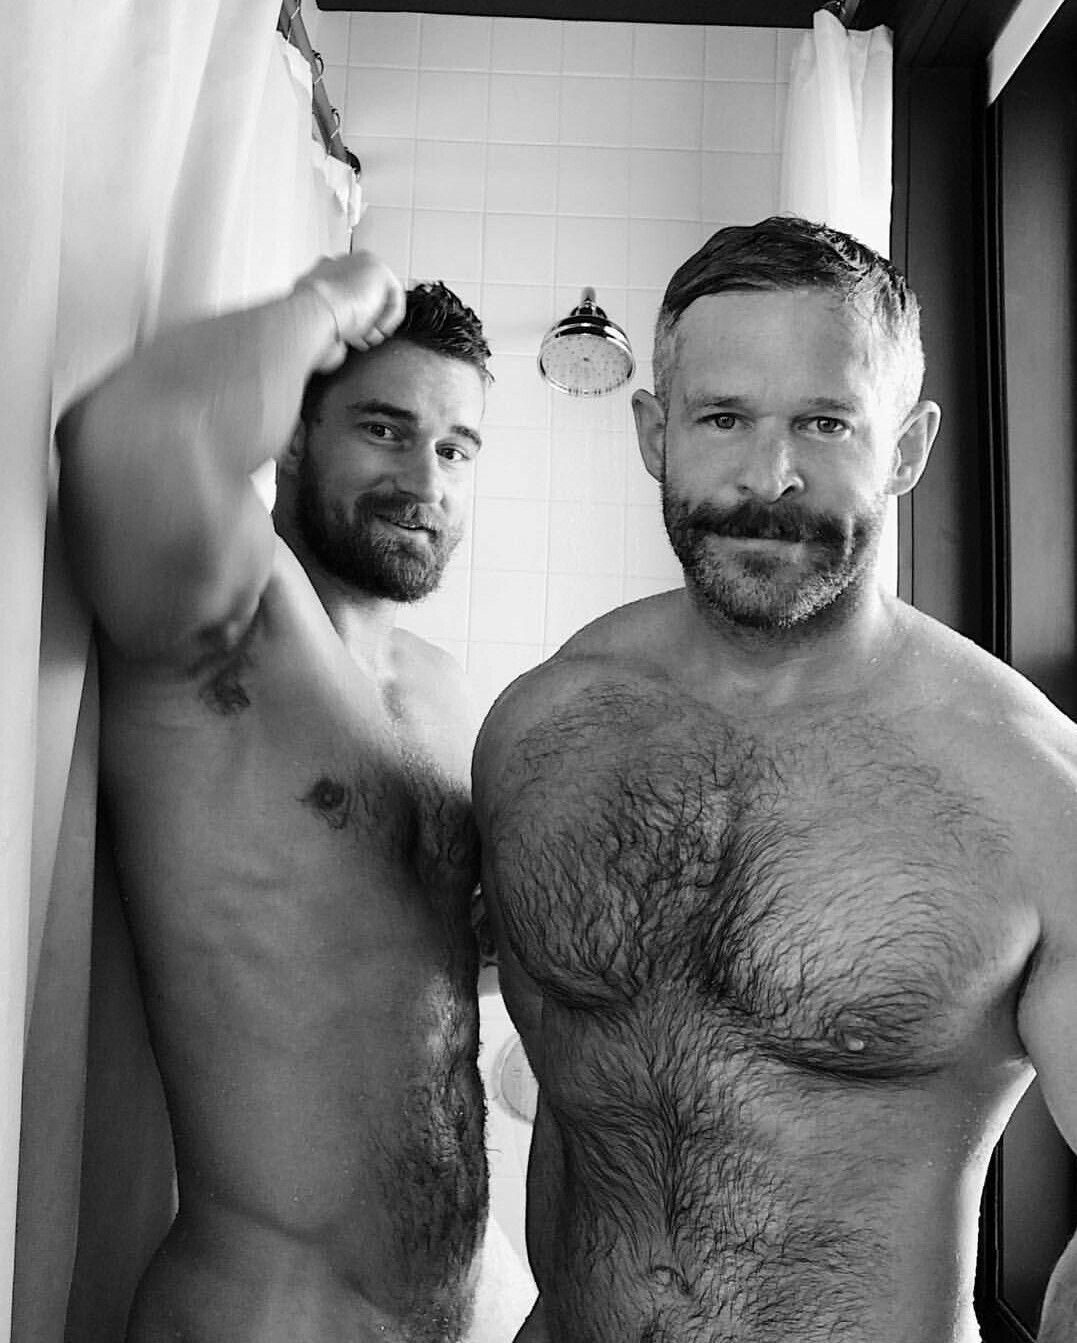 Tantra for gay men